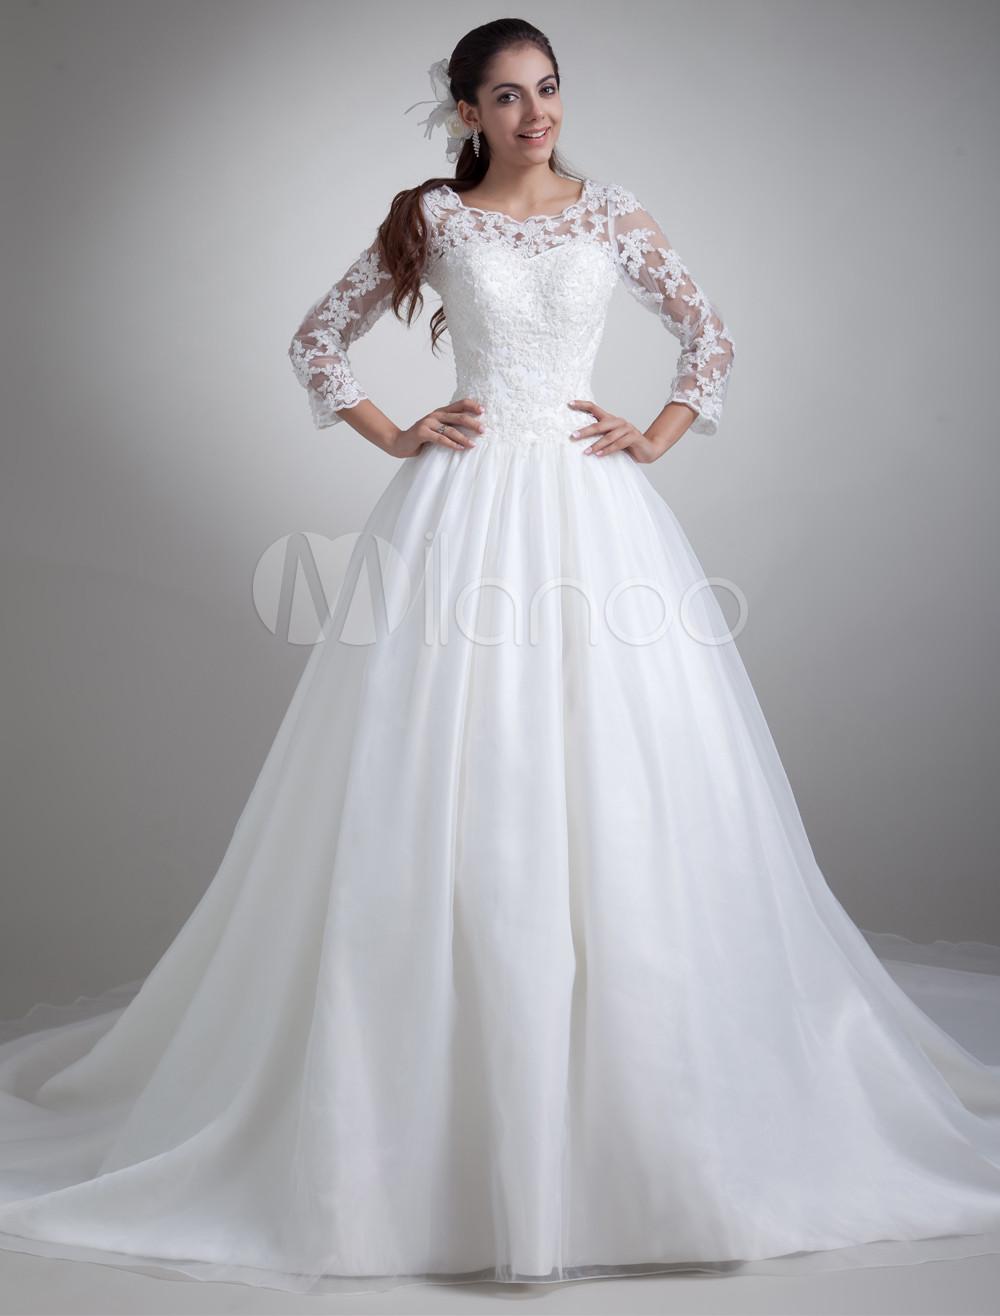 Beautiful White Jewel Neck Wedding Dress For Bride photo